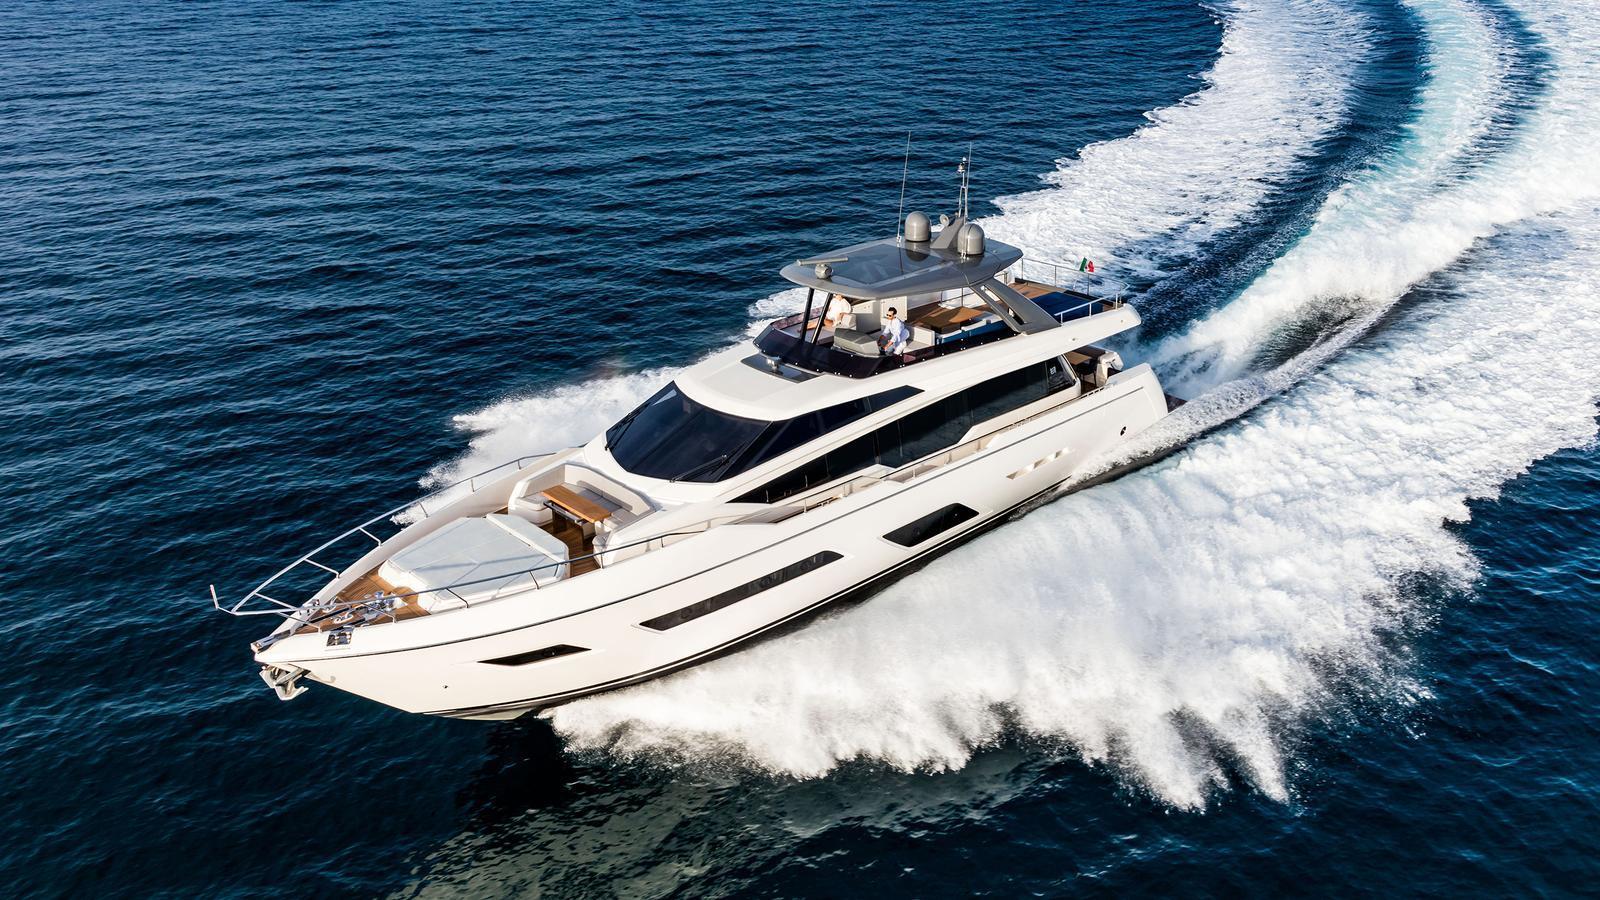 Ferretti 780 motoryacht Ferretti 24m 2019 running shot sistership